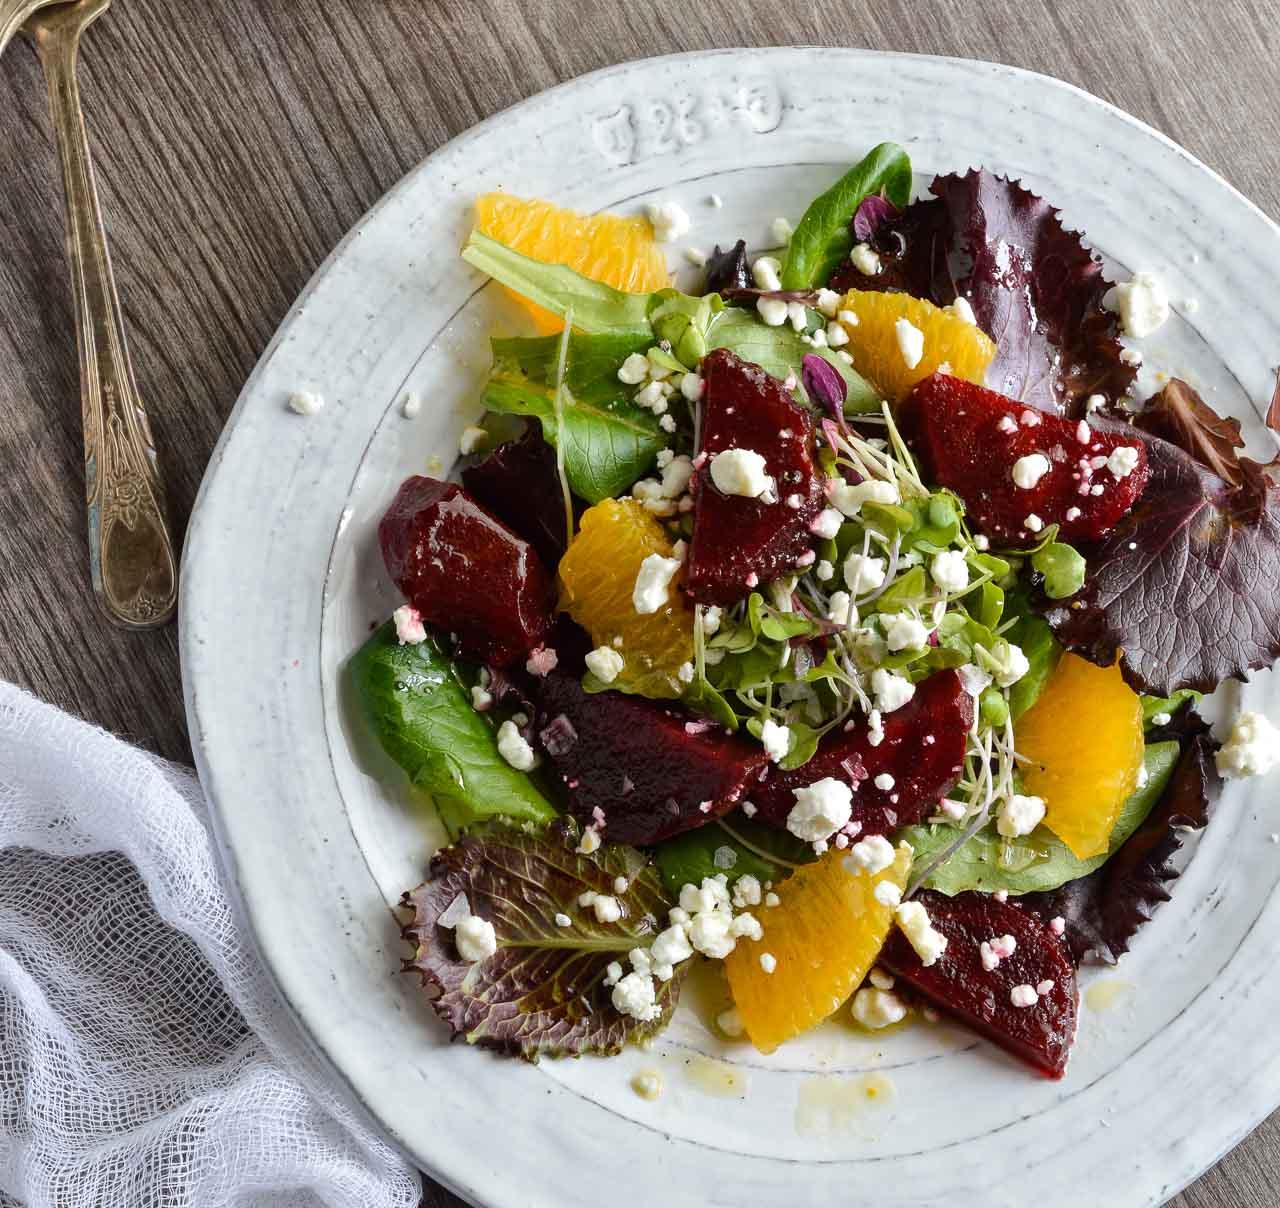 roasted beet salad with orange dressing